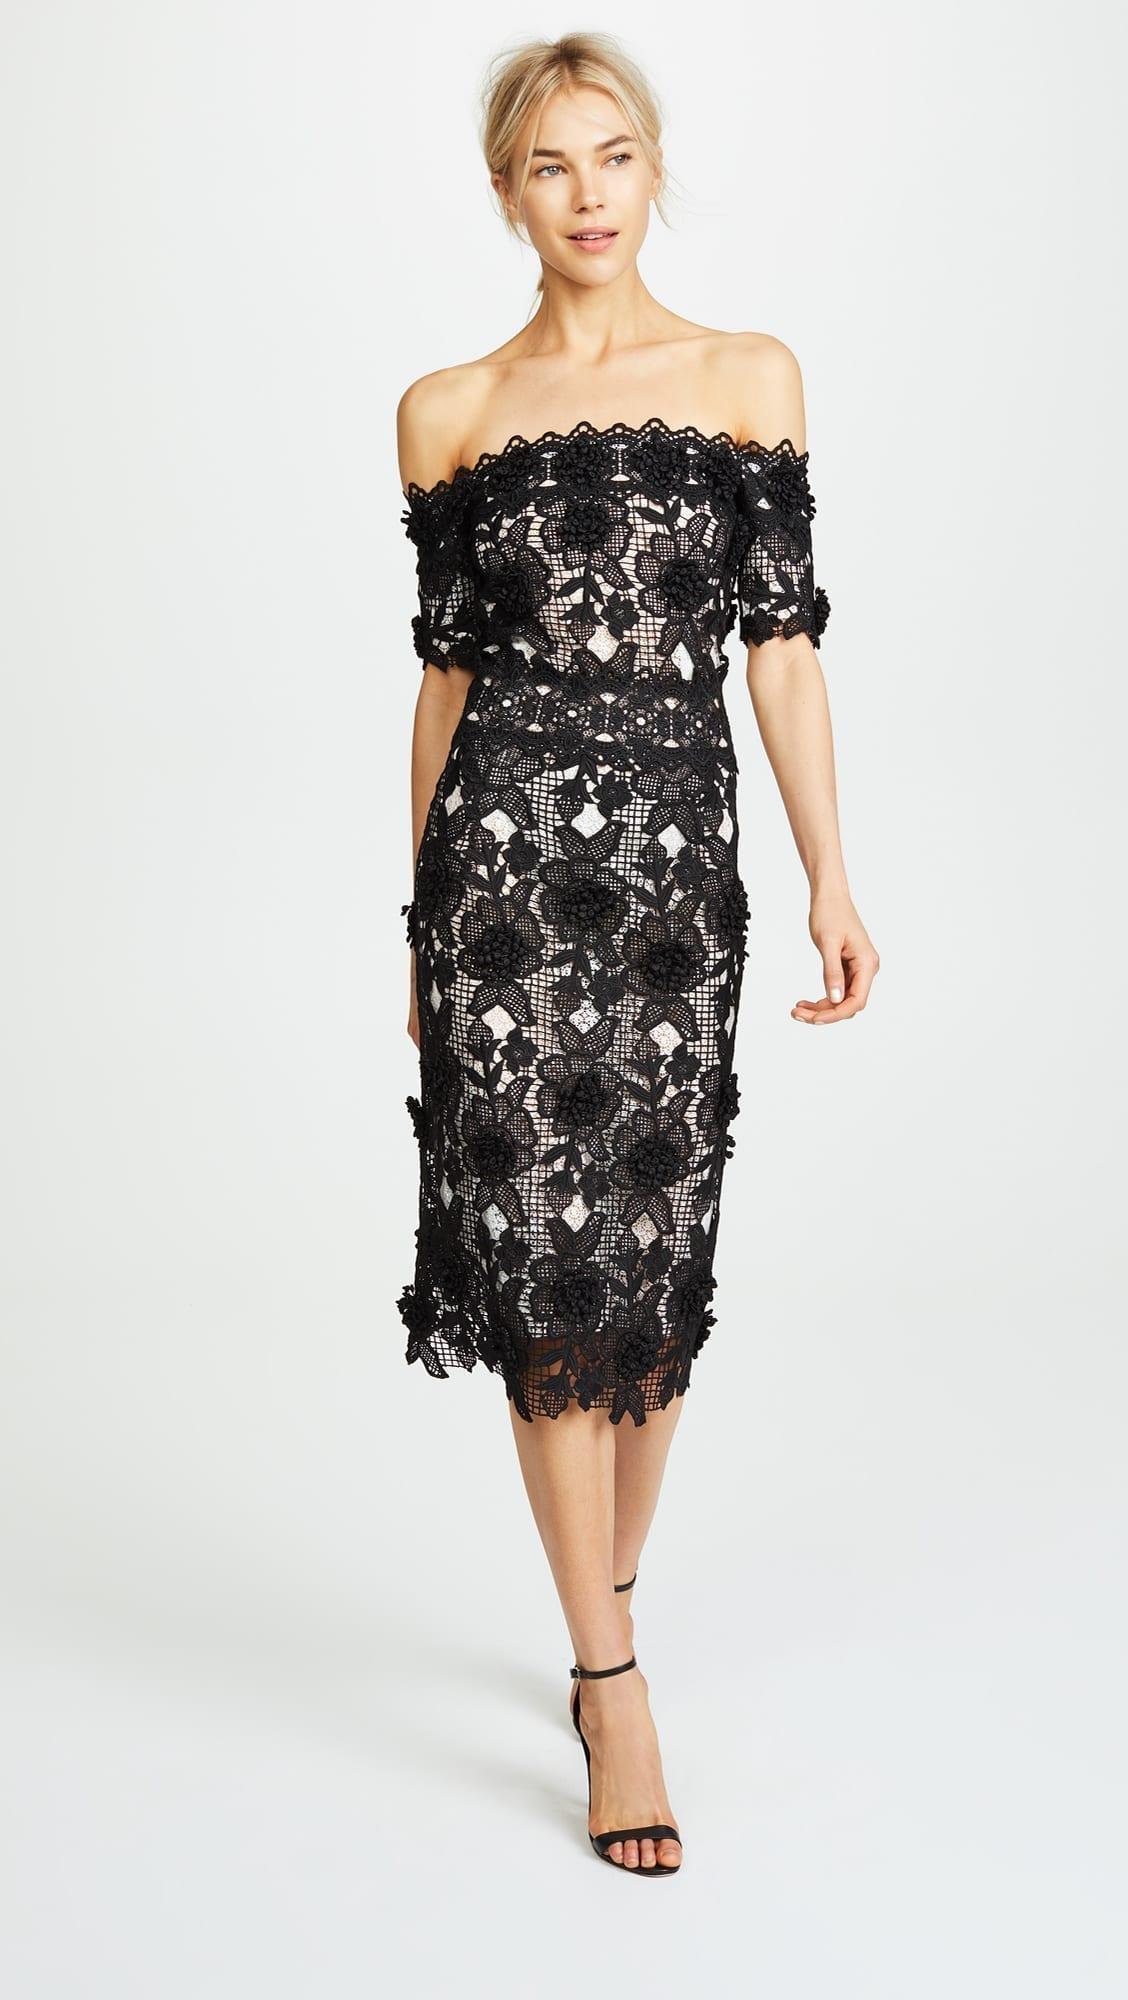 COSTARELLOS Off The Shoulder Black / White Dress